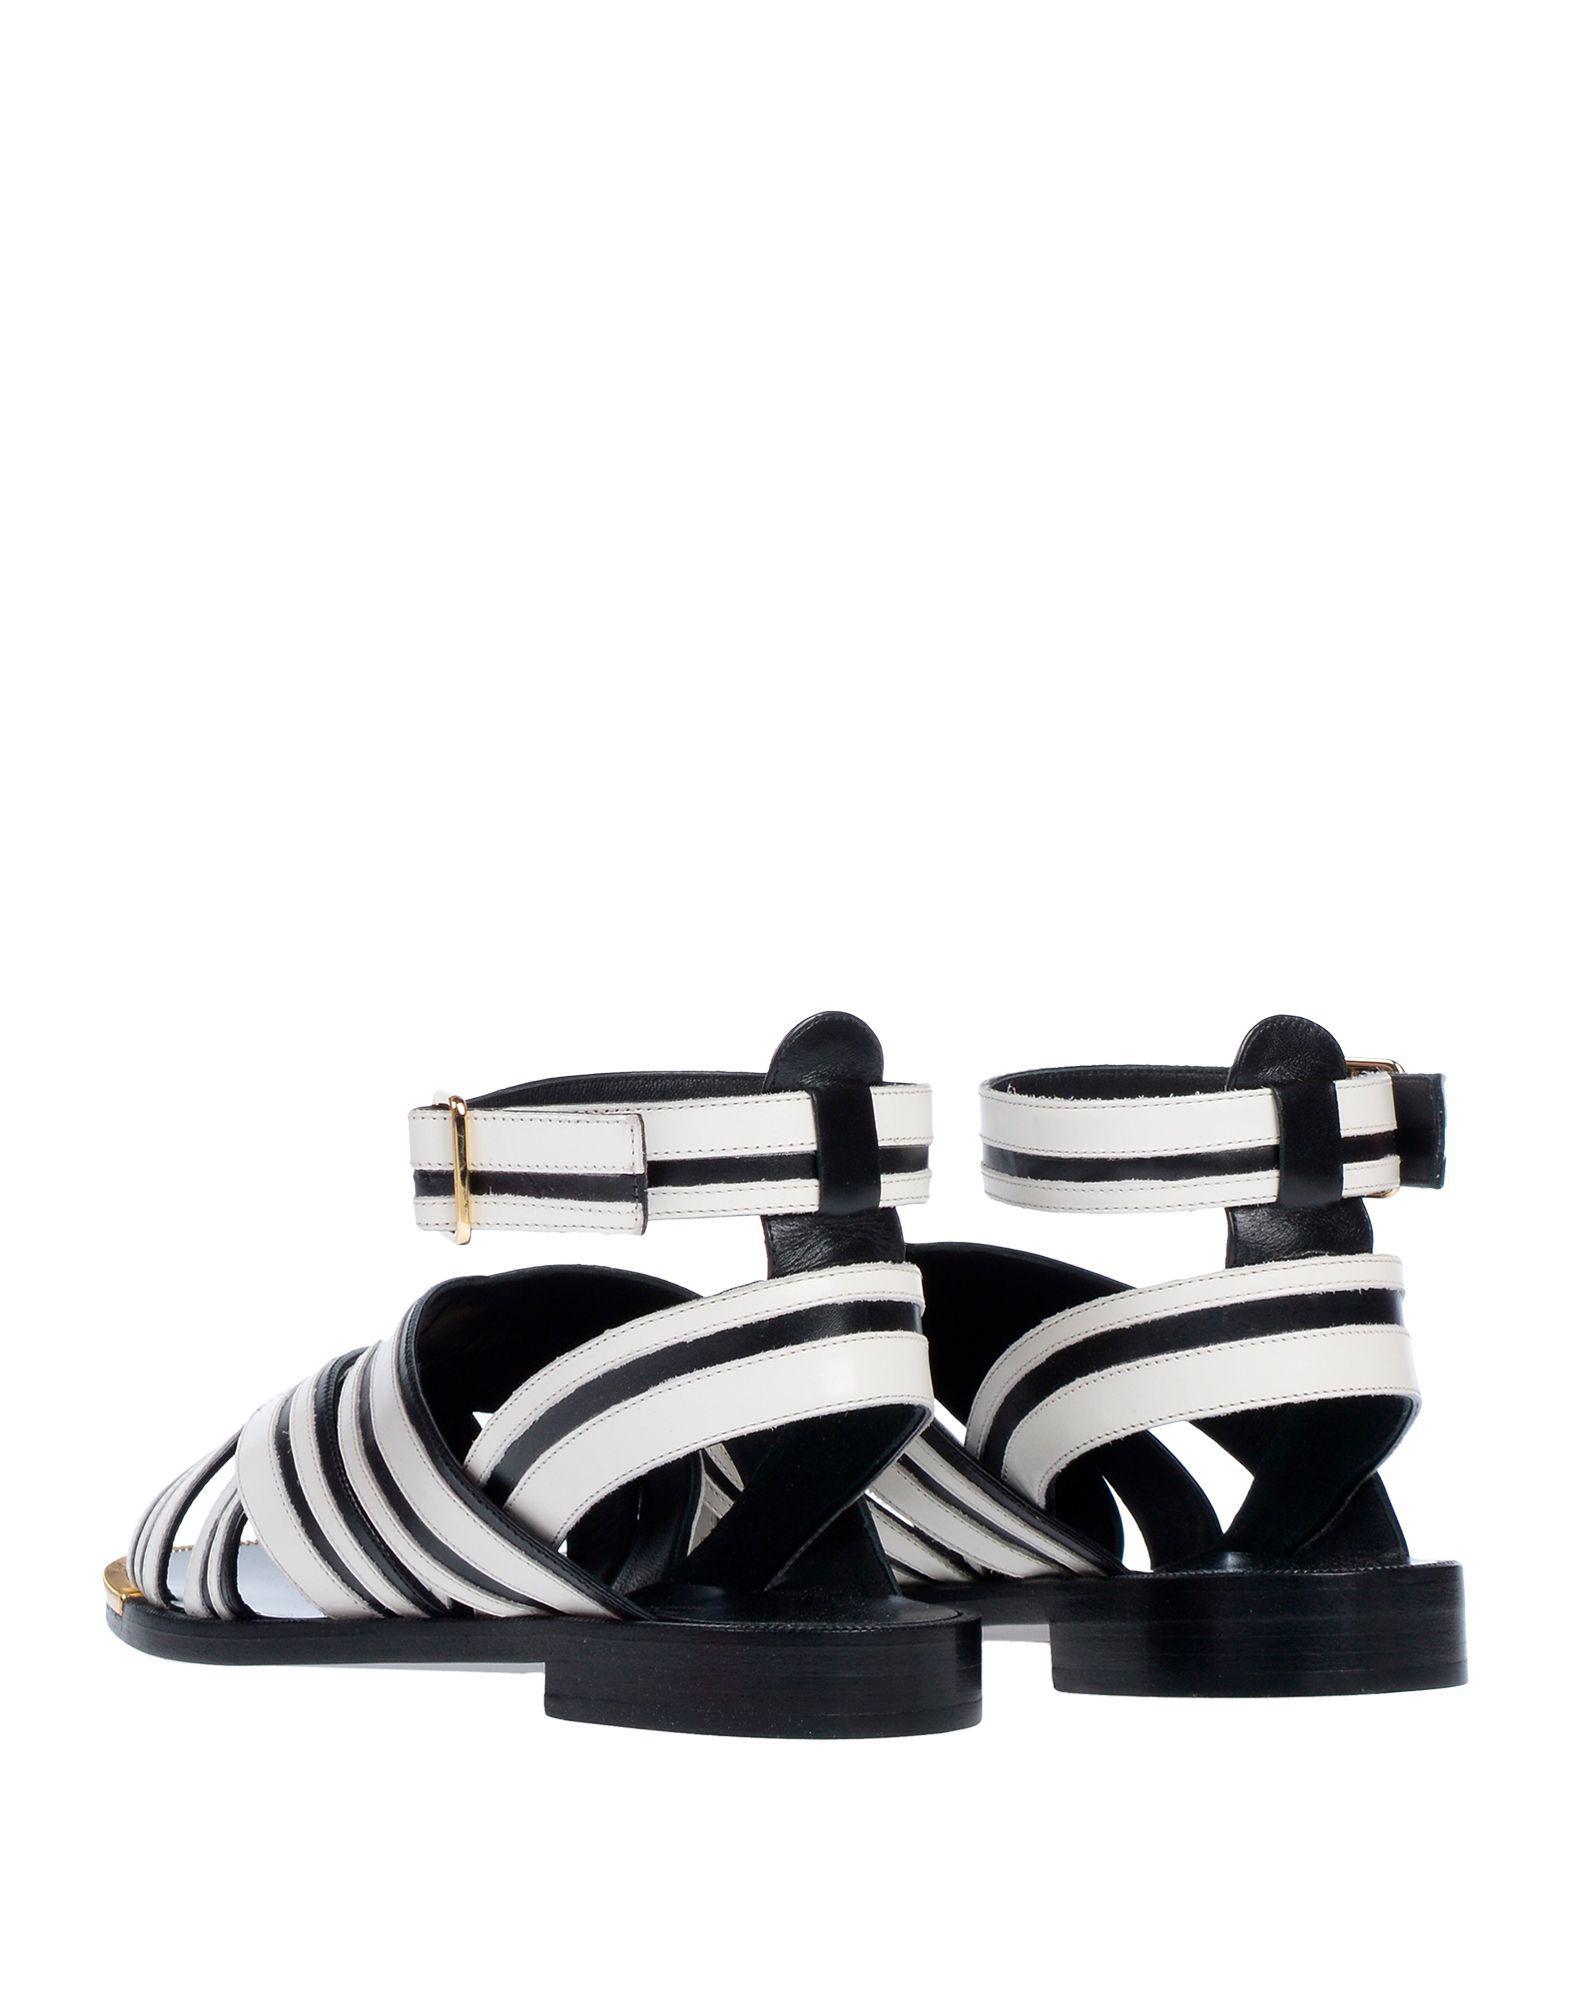 Lyst Ferragamo Sandals Sandals Lyst In Gray Ferragamo Gray Lyst In Ferragamo Sandals reCBodxW